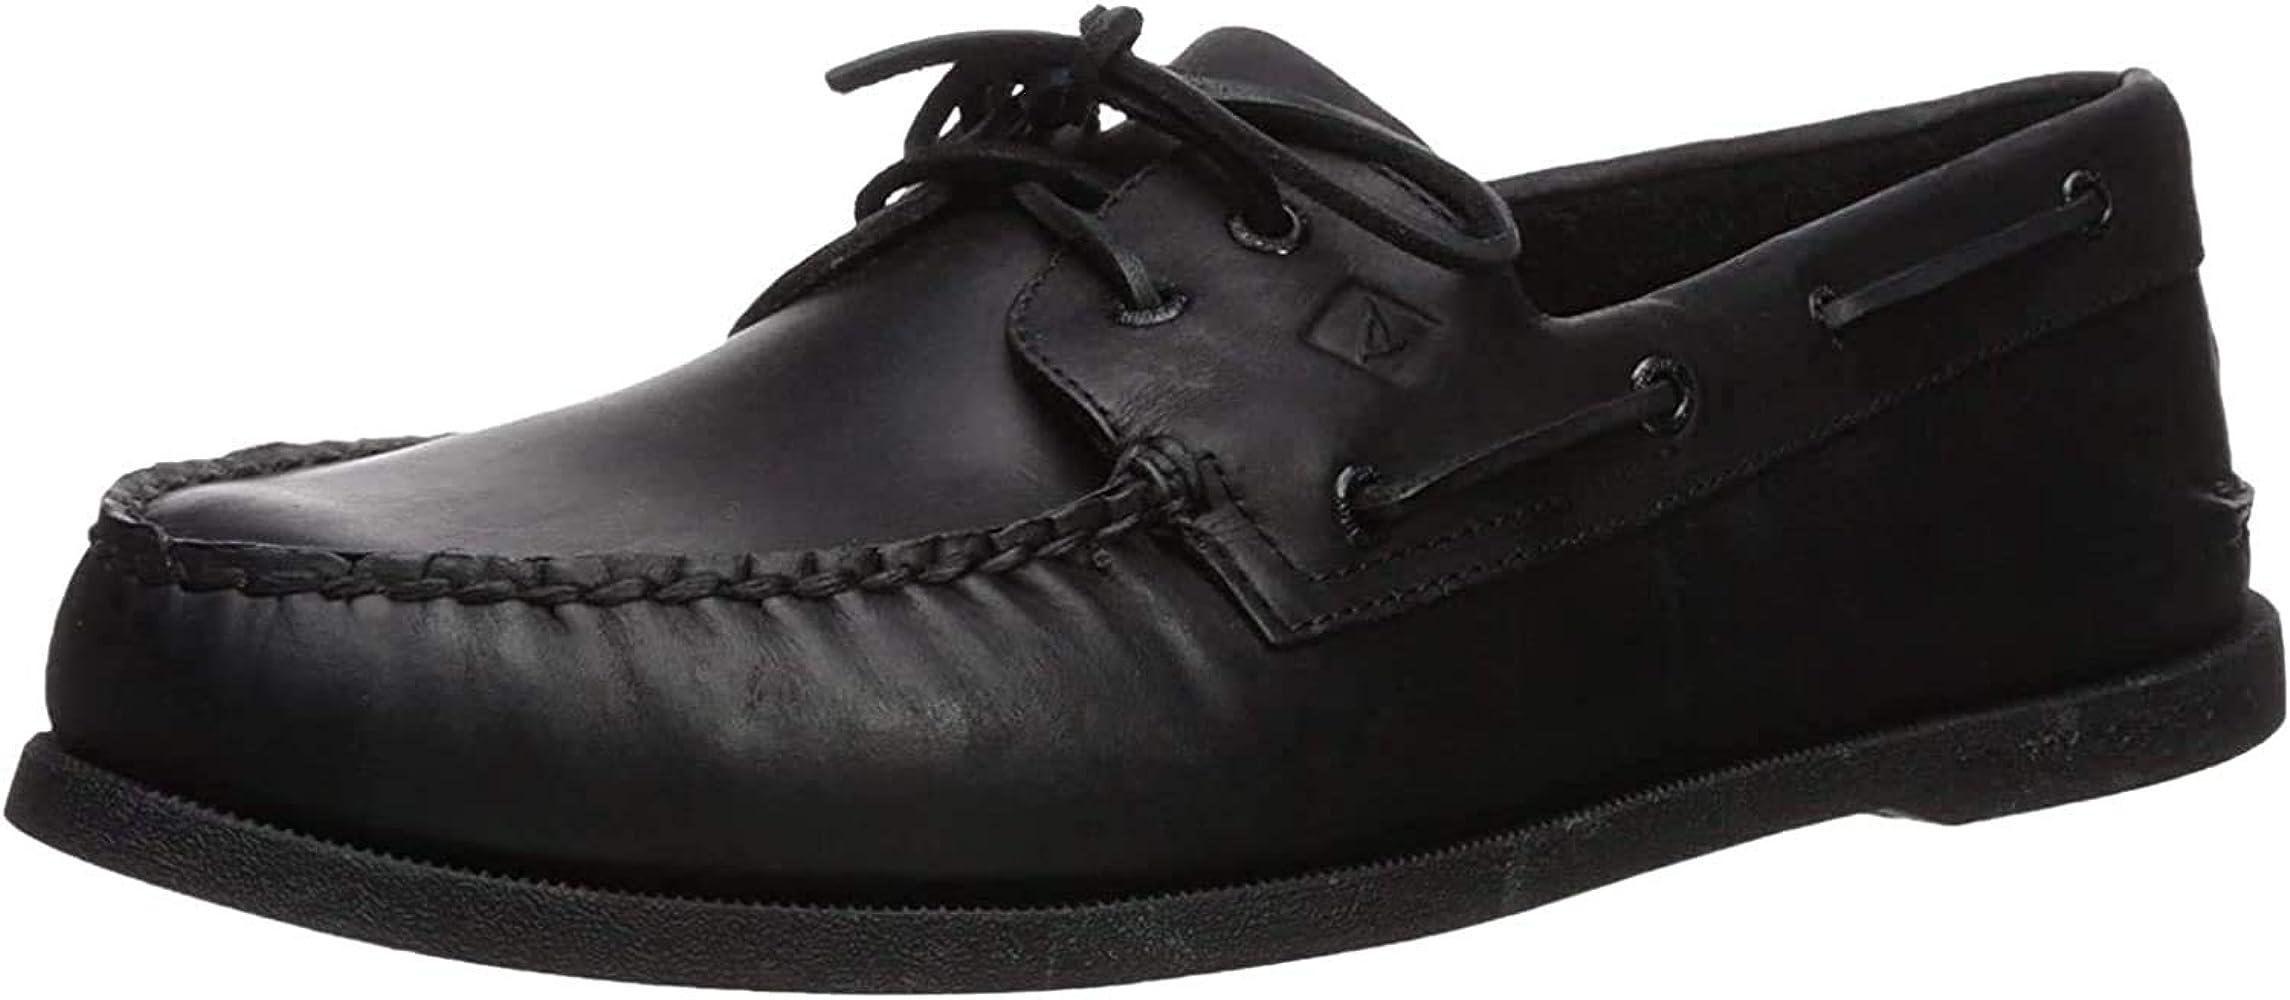 Sperry Mens A/O 2-Eye Boat Shoe, Black